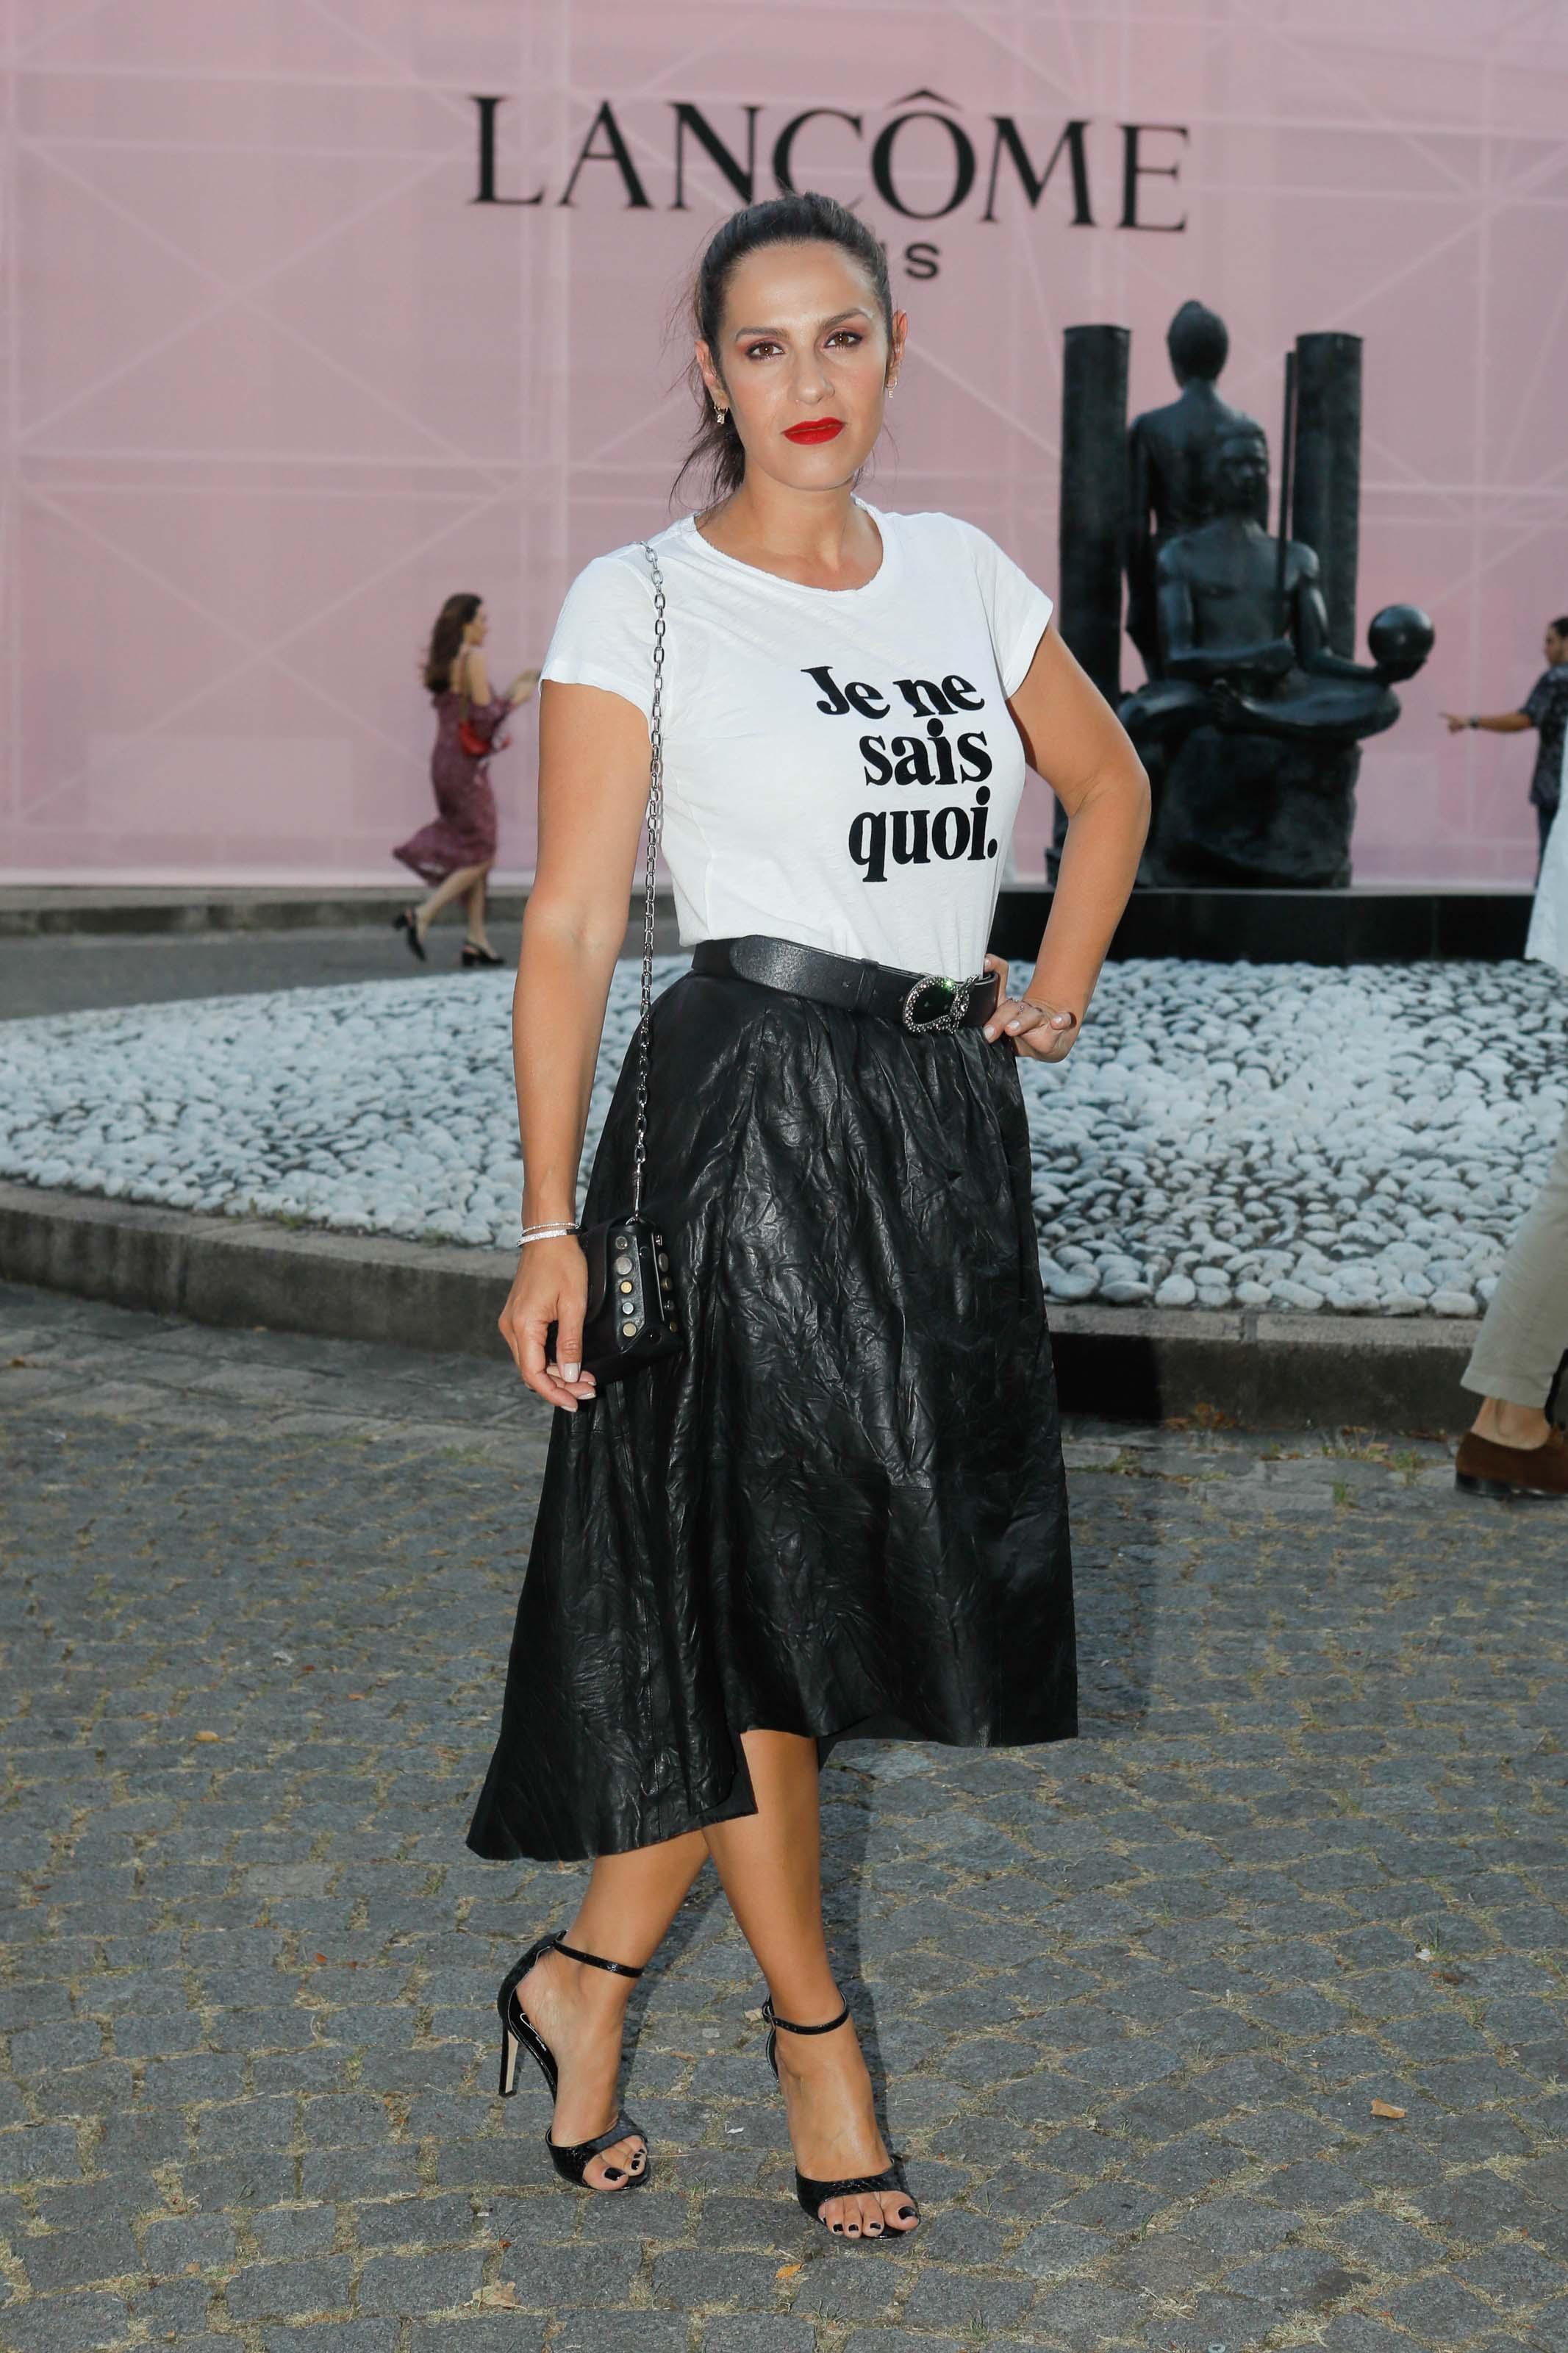 Elisa Tovati attends Lancome party